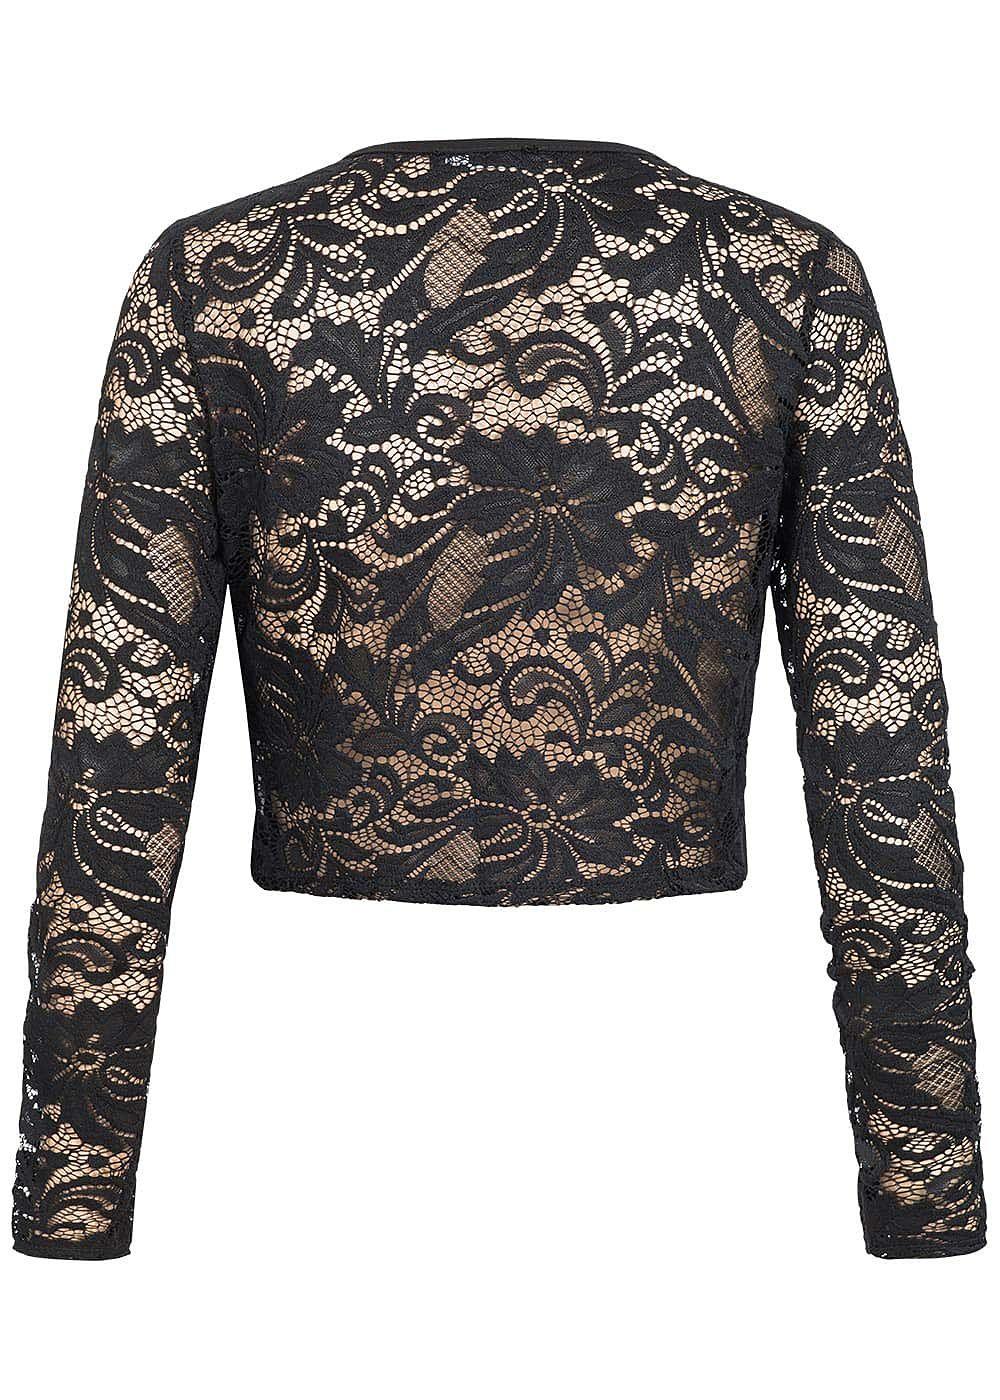 styleboom fashion damen chiffon bolero spitze schwarz 77onlineshop. Black Bedroom Furniture Sets. Home Design Ideas